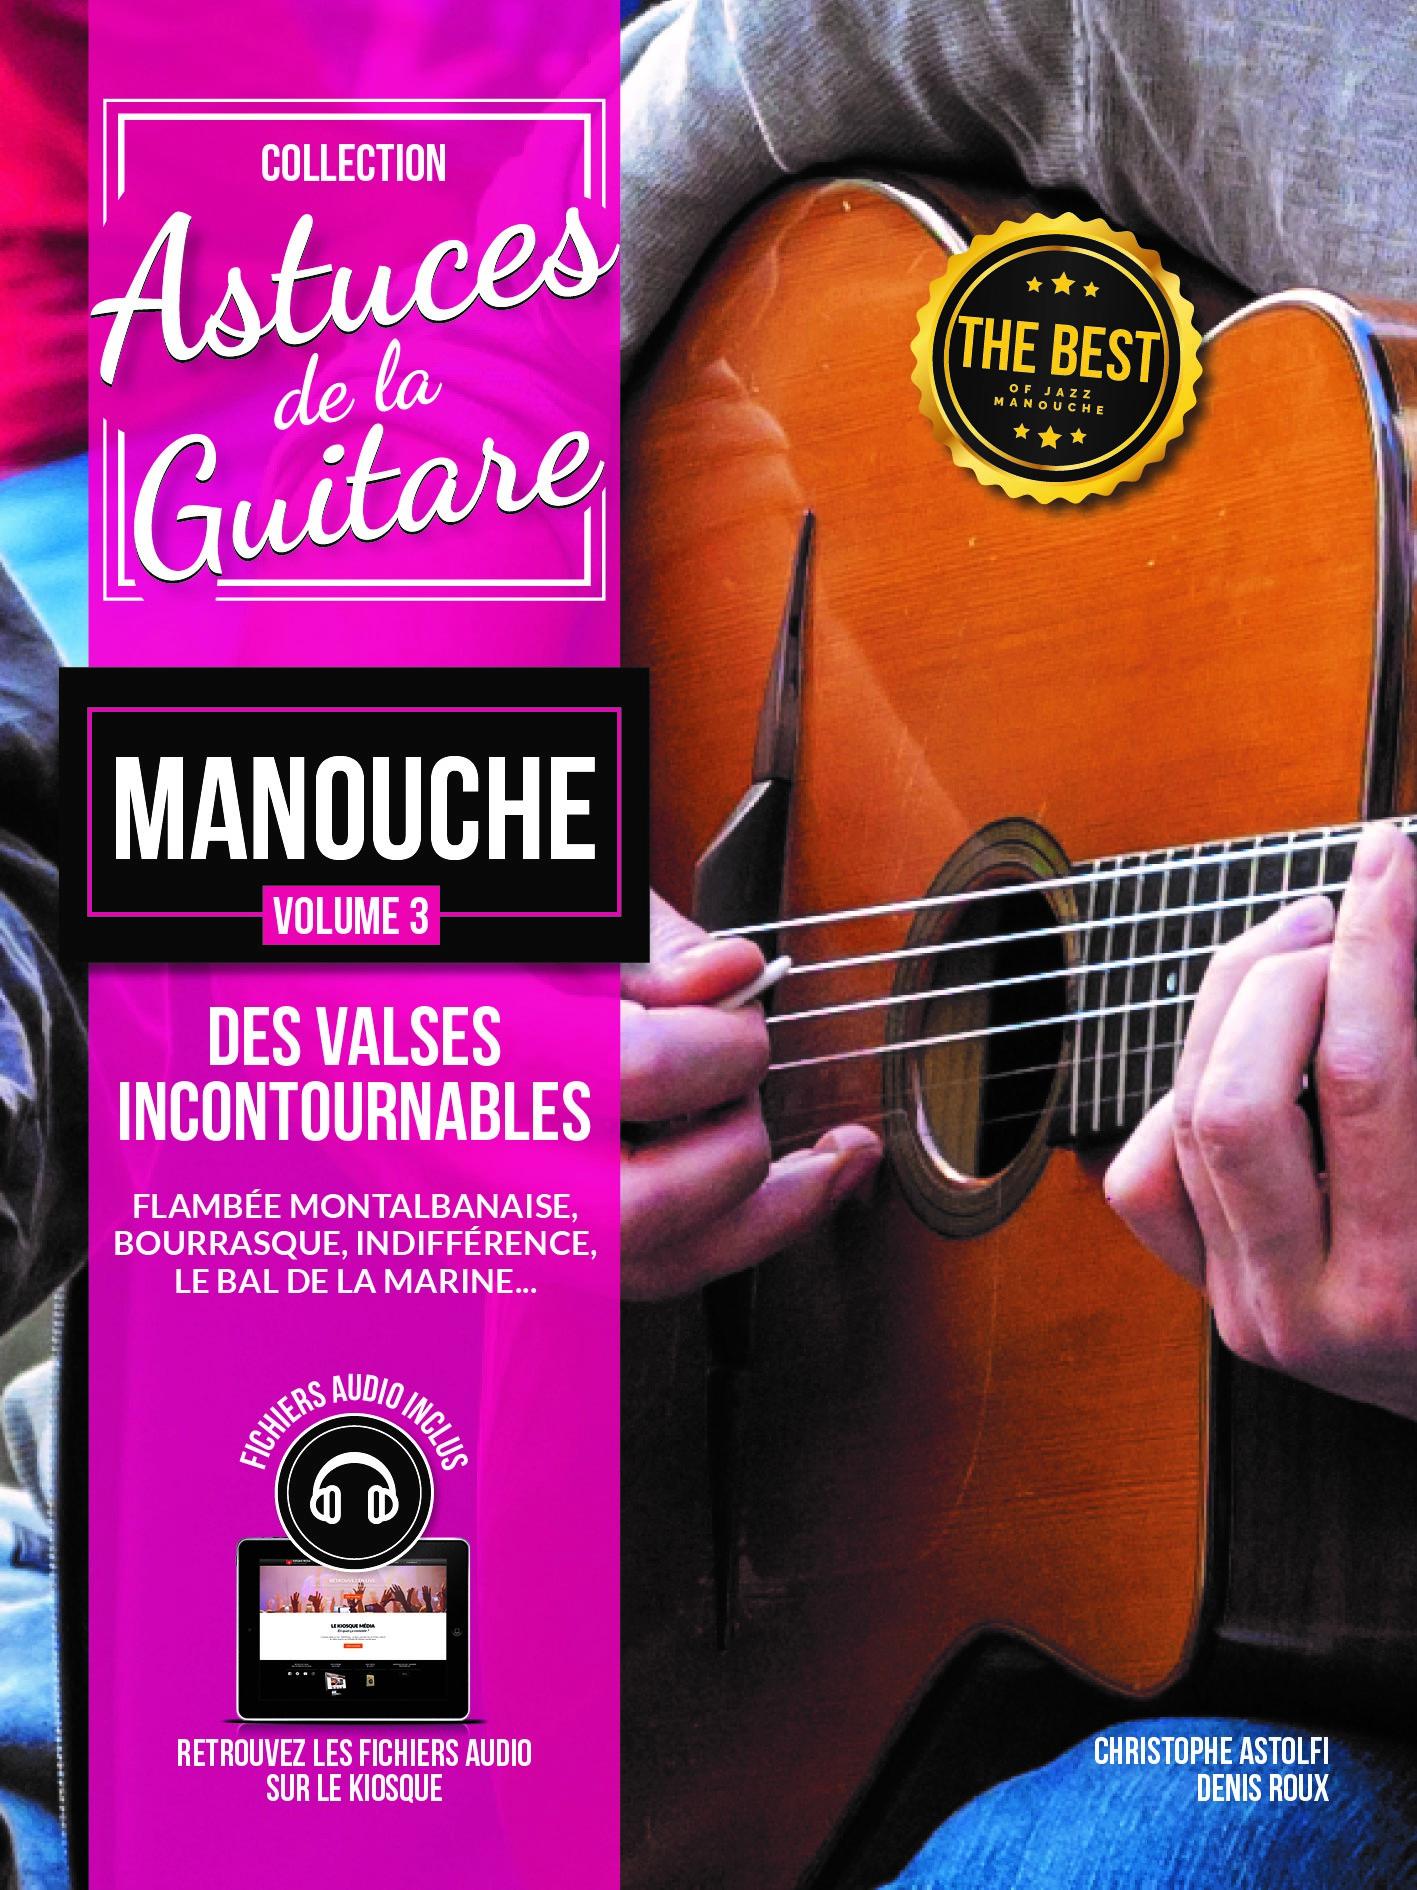 Astuces de La guitare Manouche Vol 3